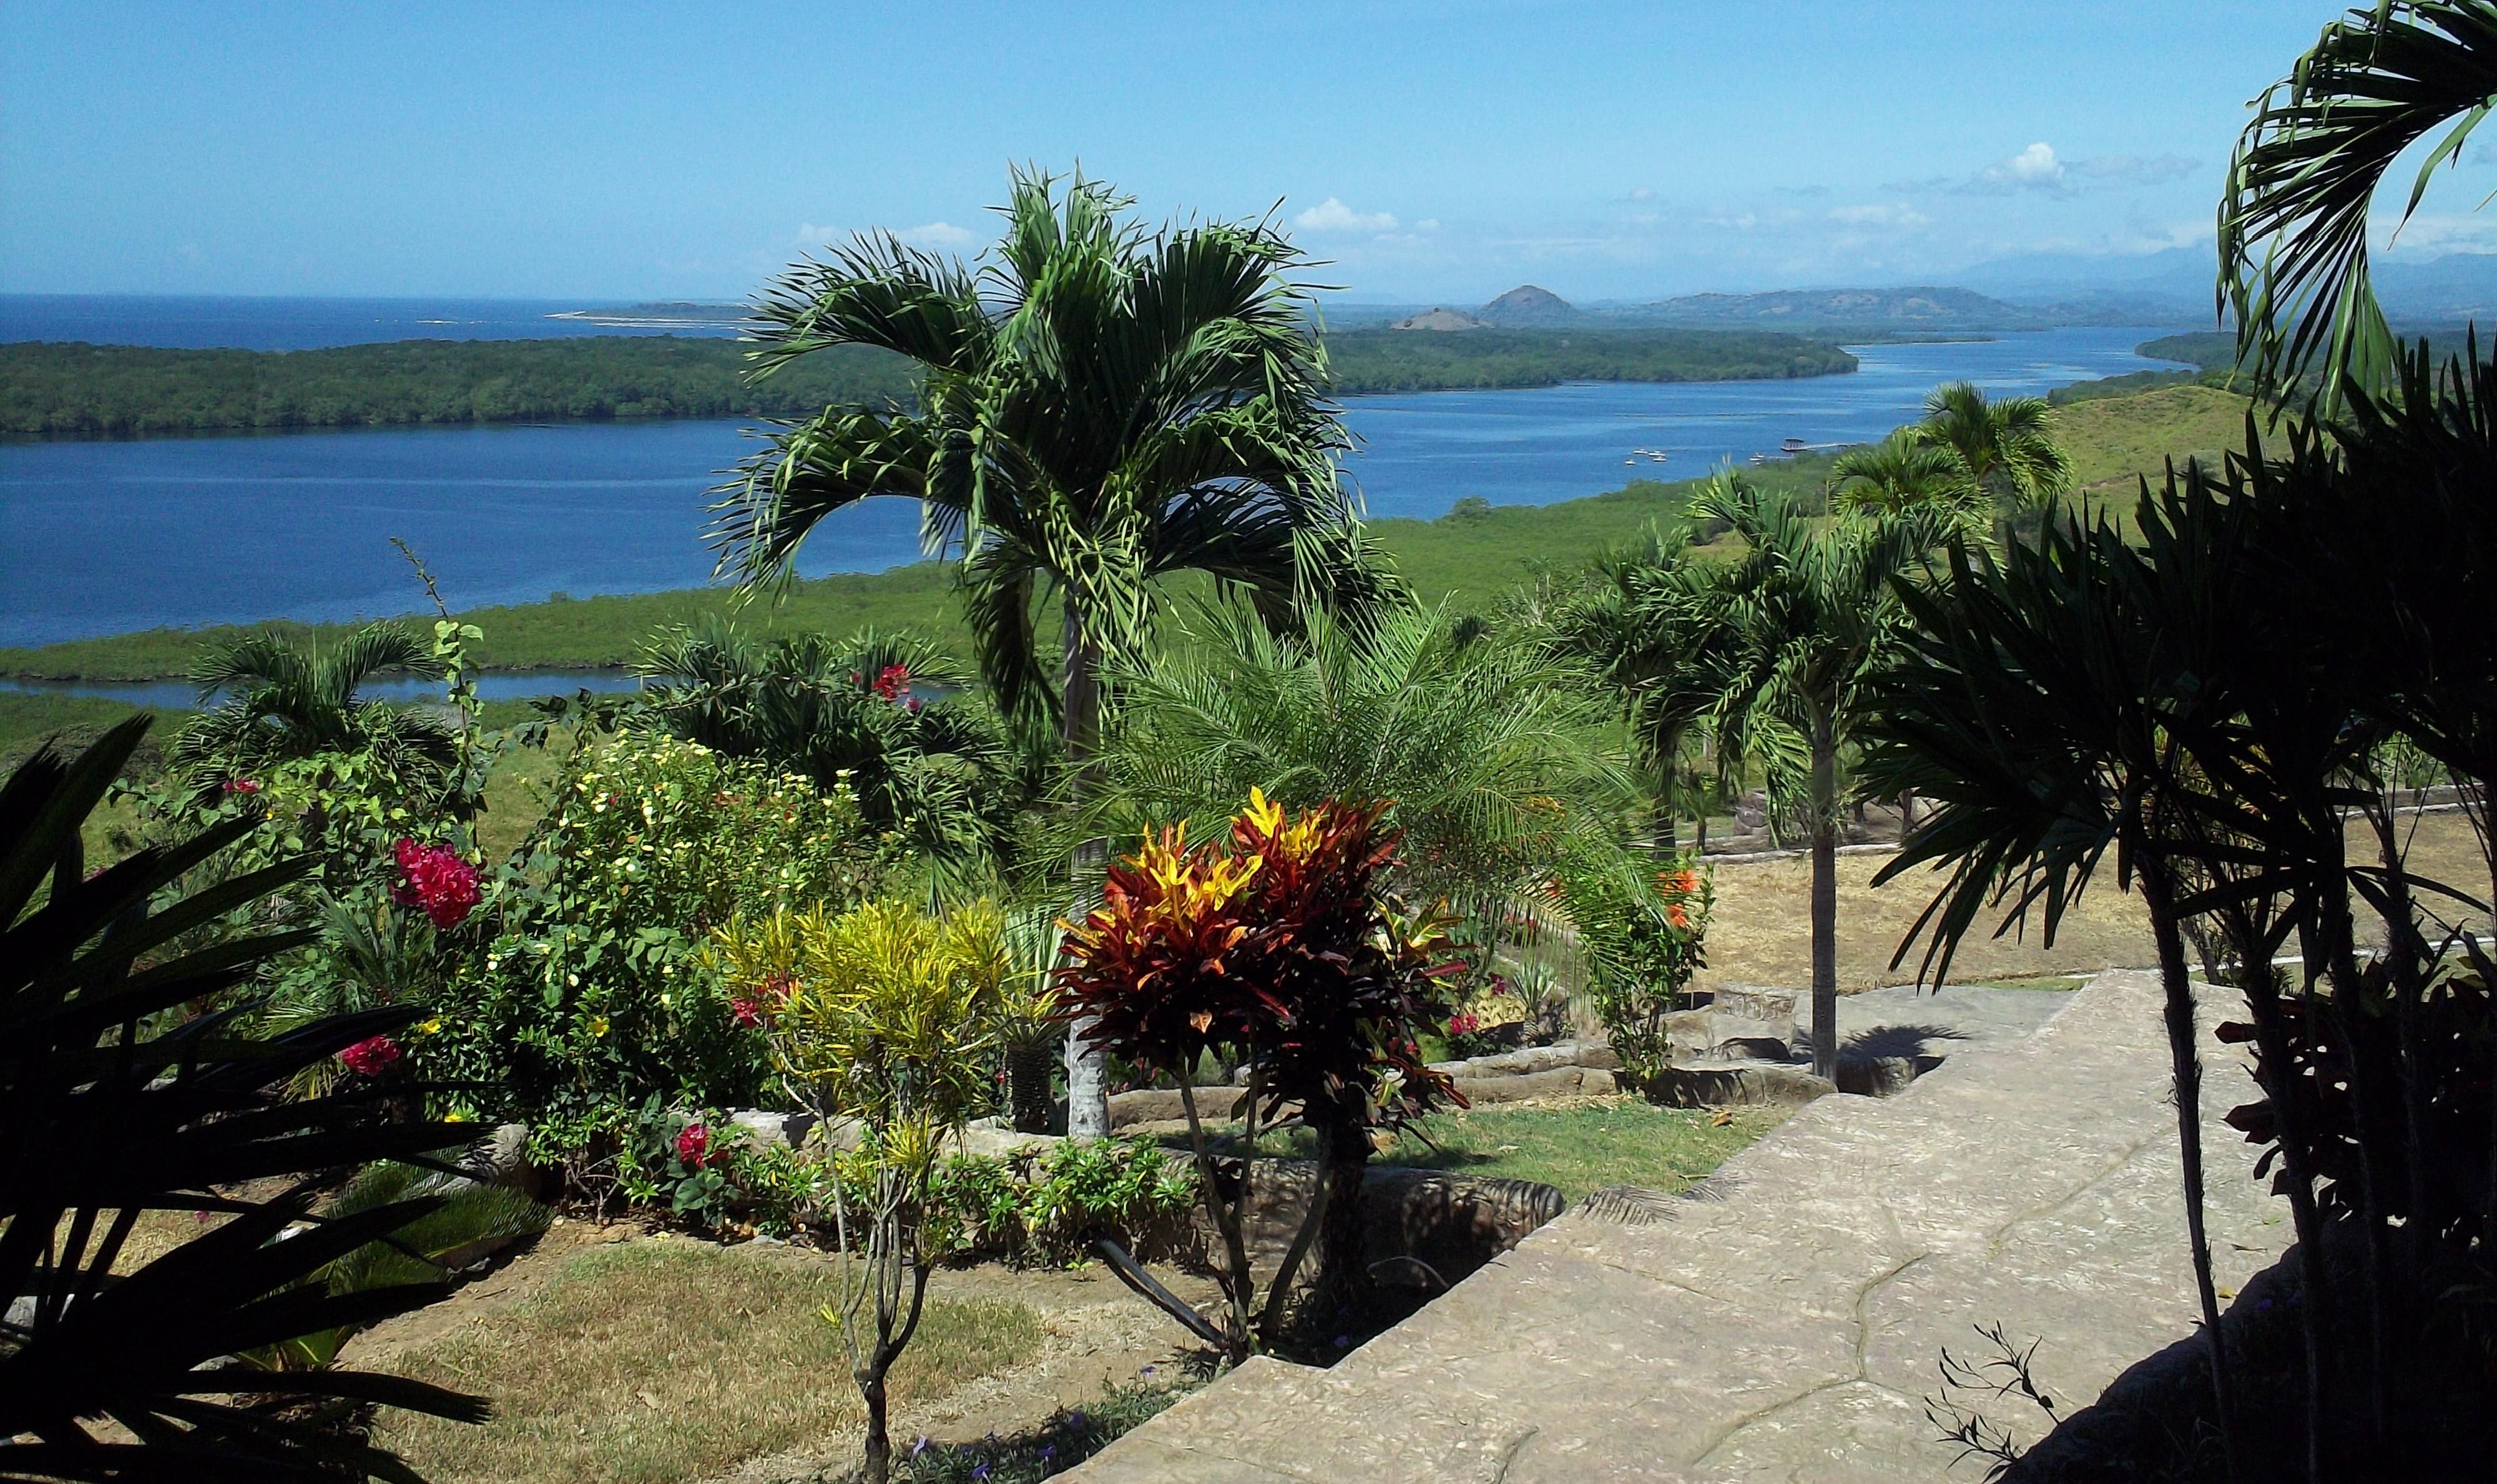 Panama sport fishing resort fleet marina and deep water for Fishing lodge for sale